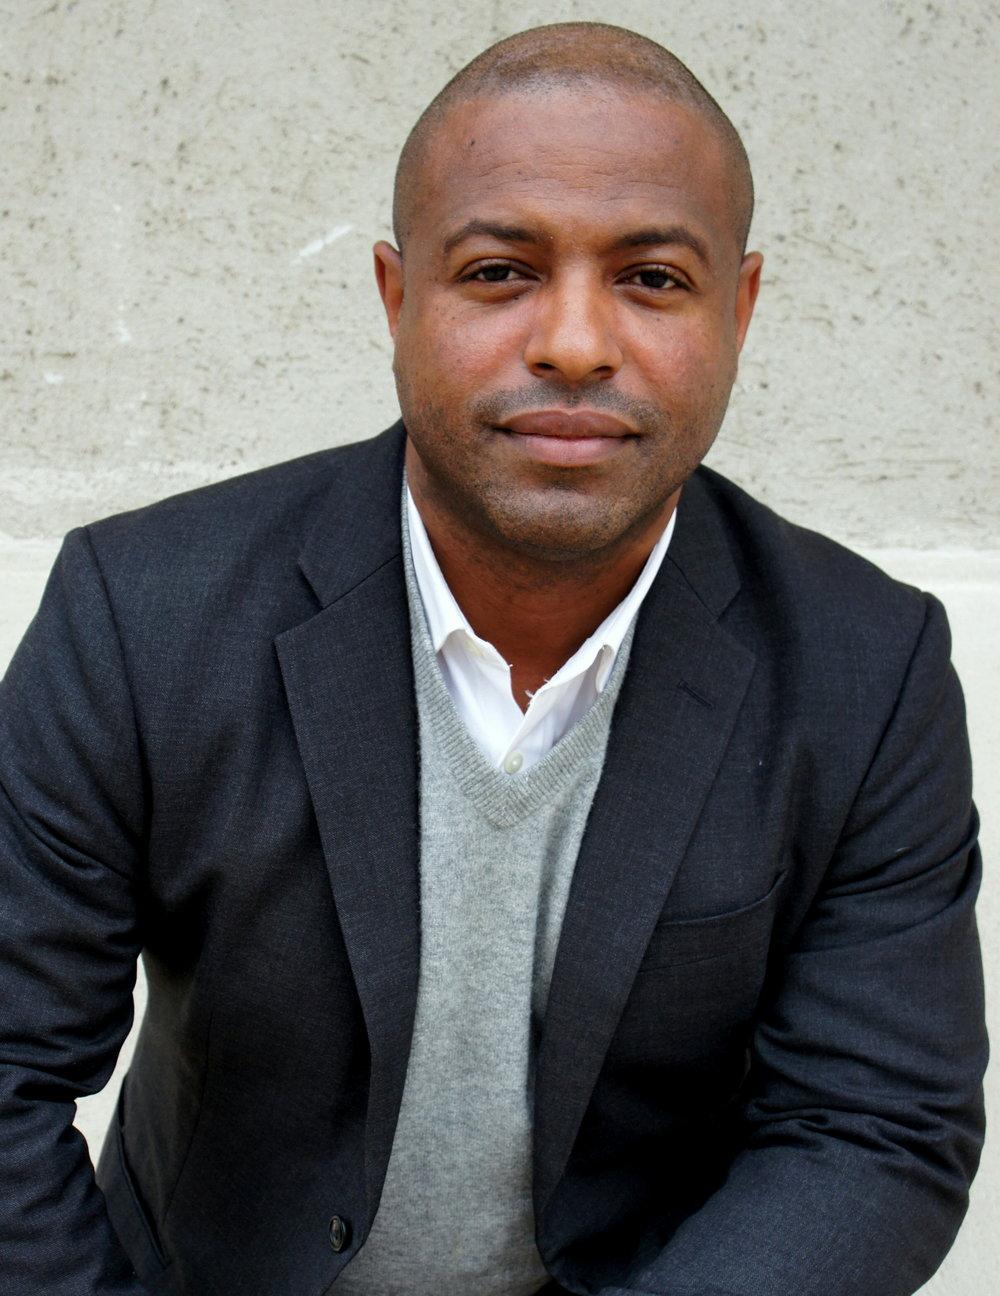 Malo Hutson    @MaloAndreHutson   Associate Professor and Director of the Urban Community and Health Equity Lab at Columbia University